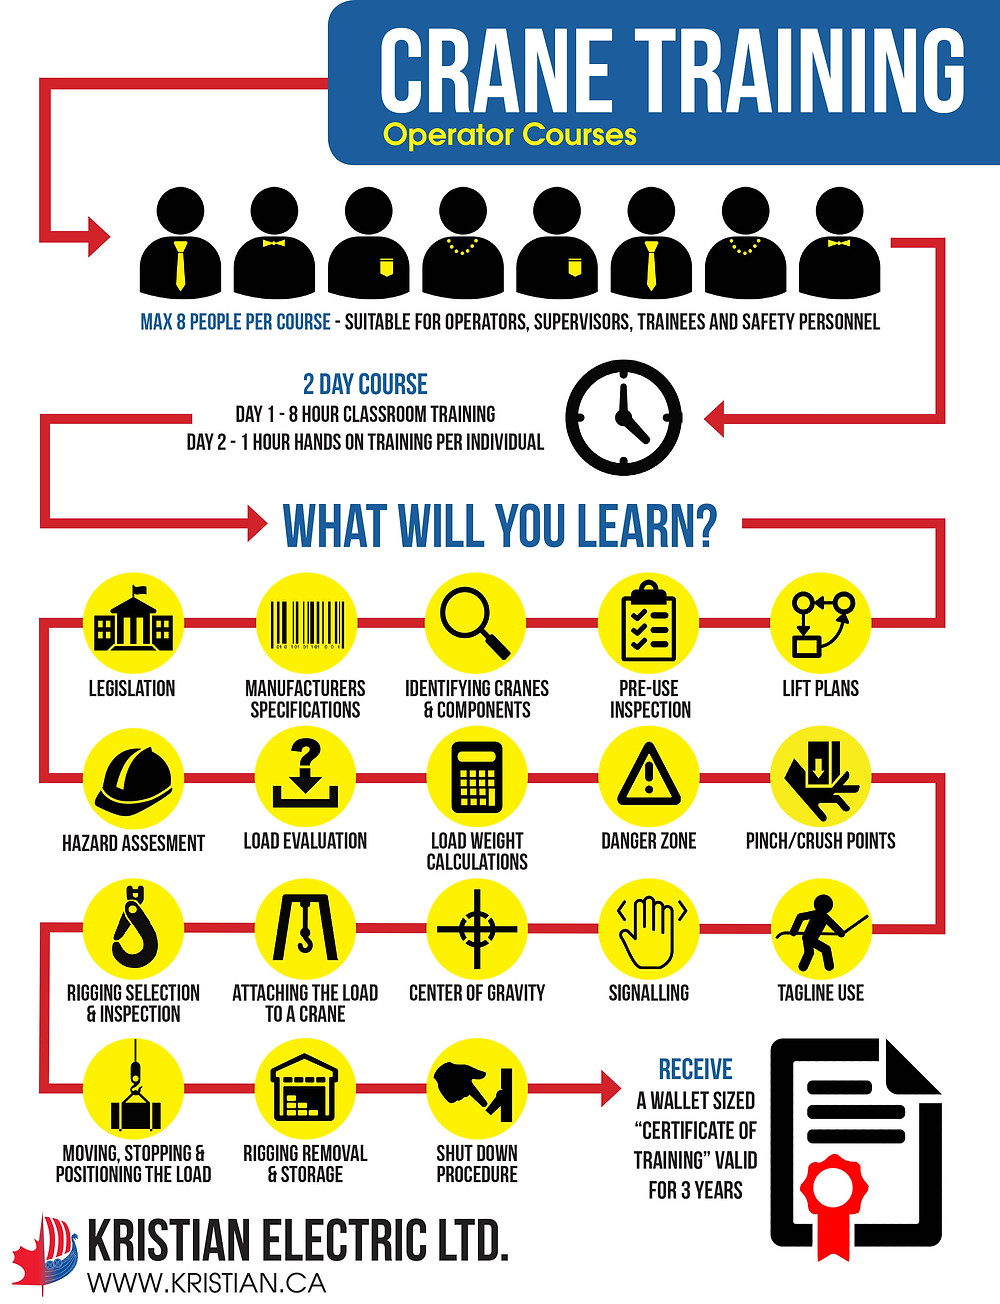 Overhead Crane Training Infographic - Calgary, Edmonton, Saskatoon